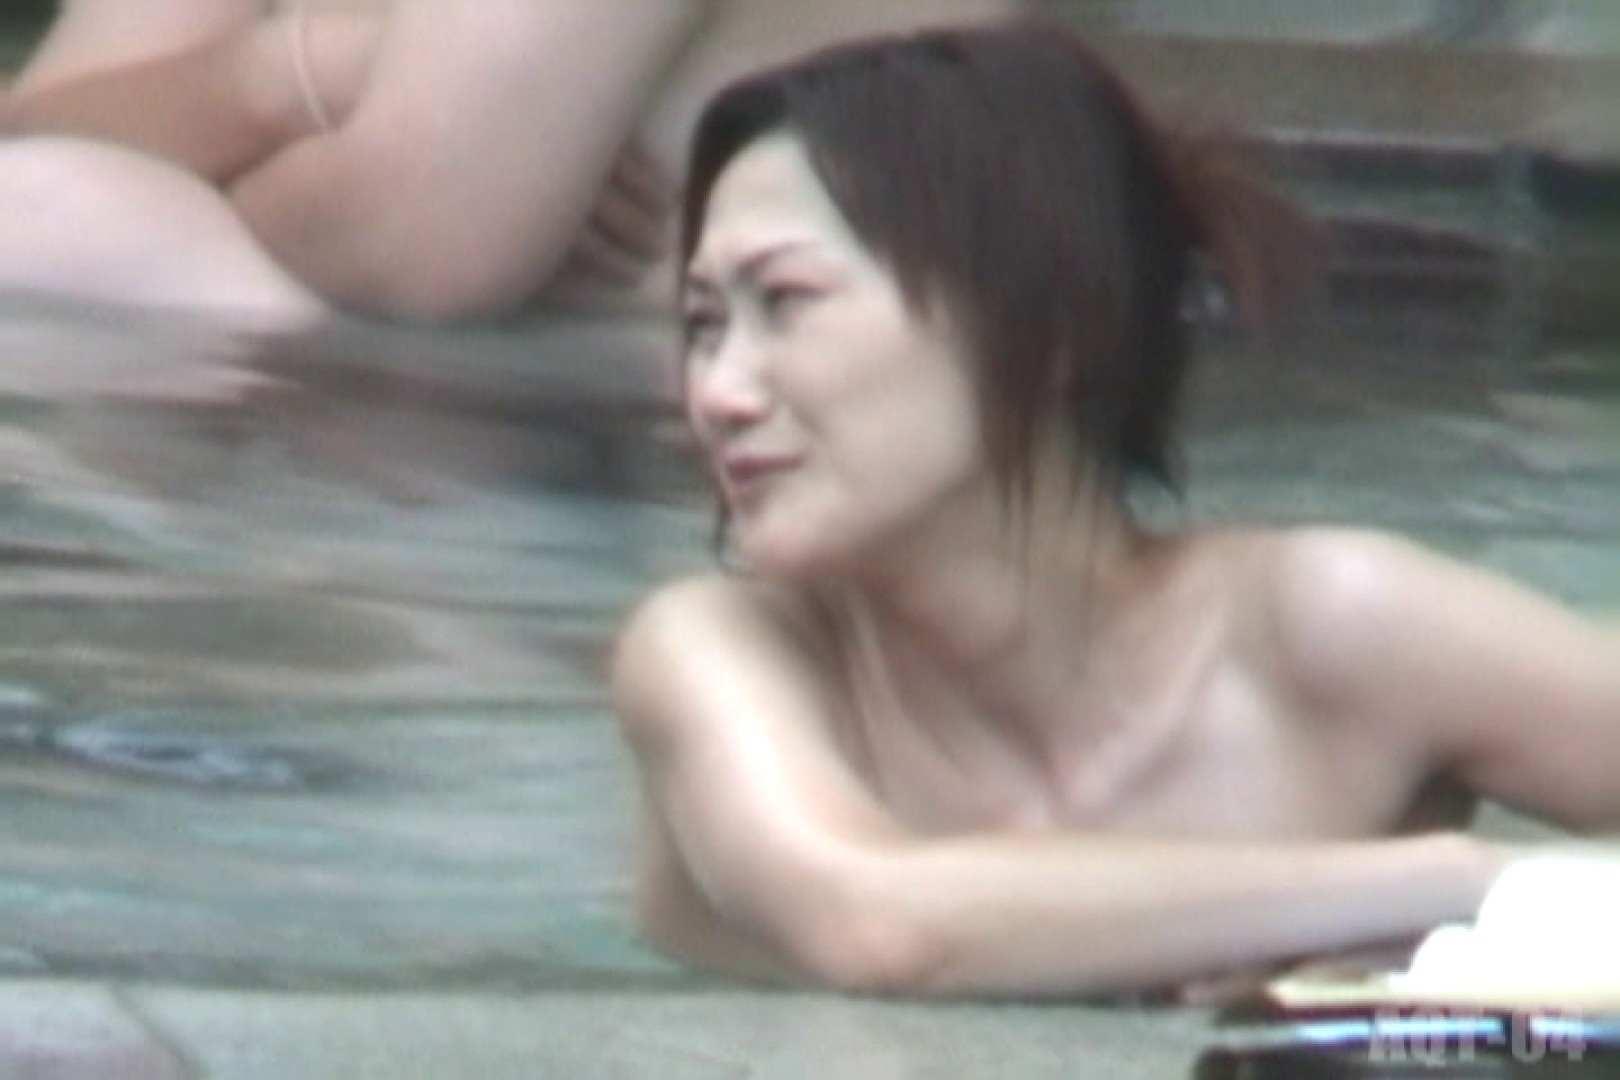 Aquaな露天風呂Vol.739 0  95連発 70